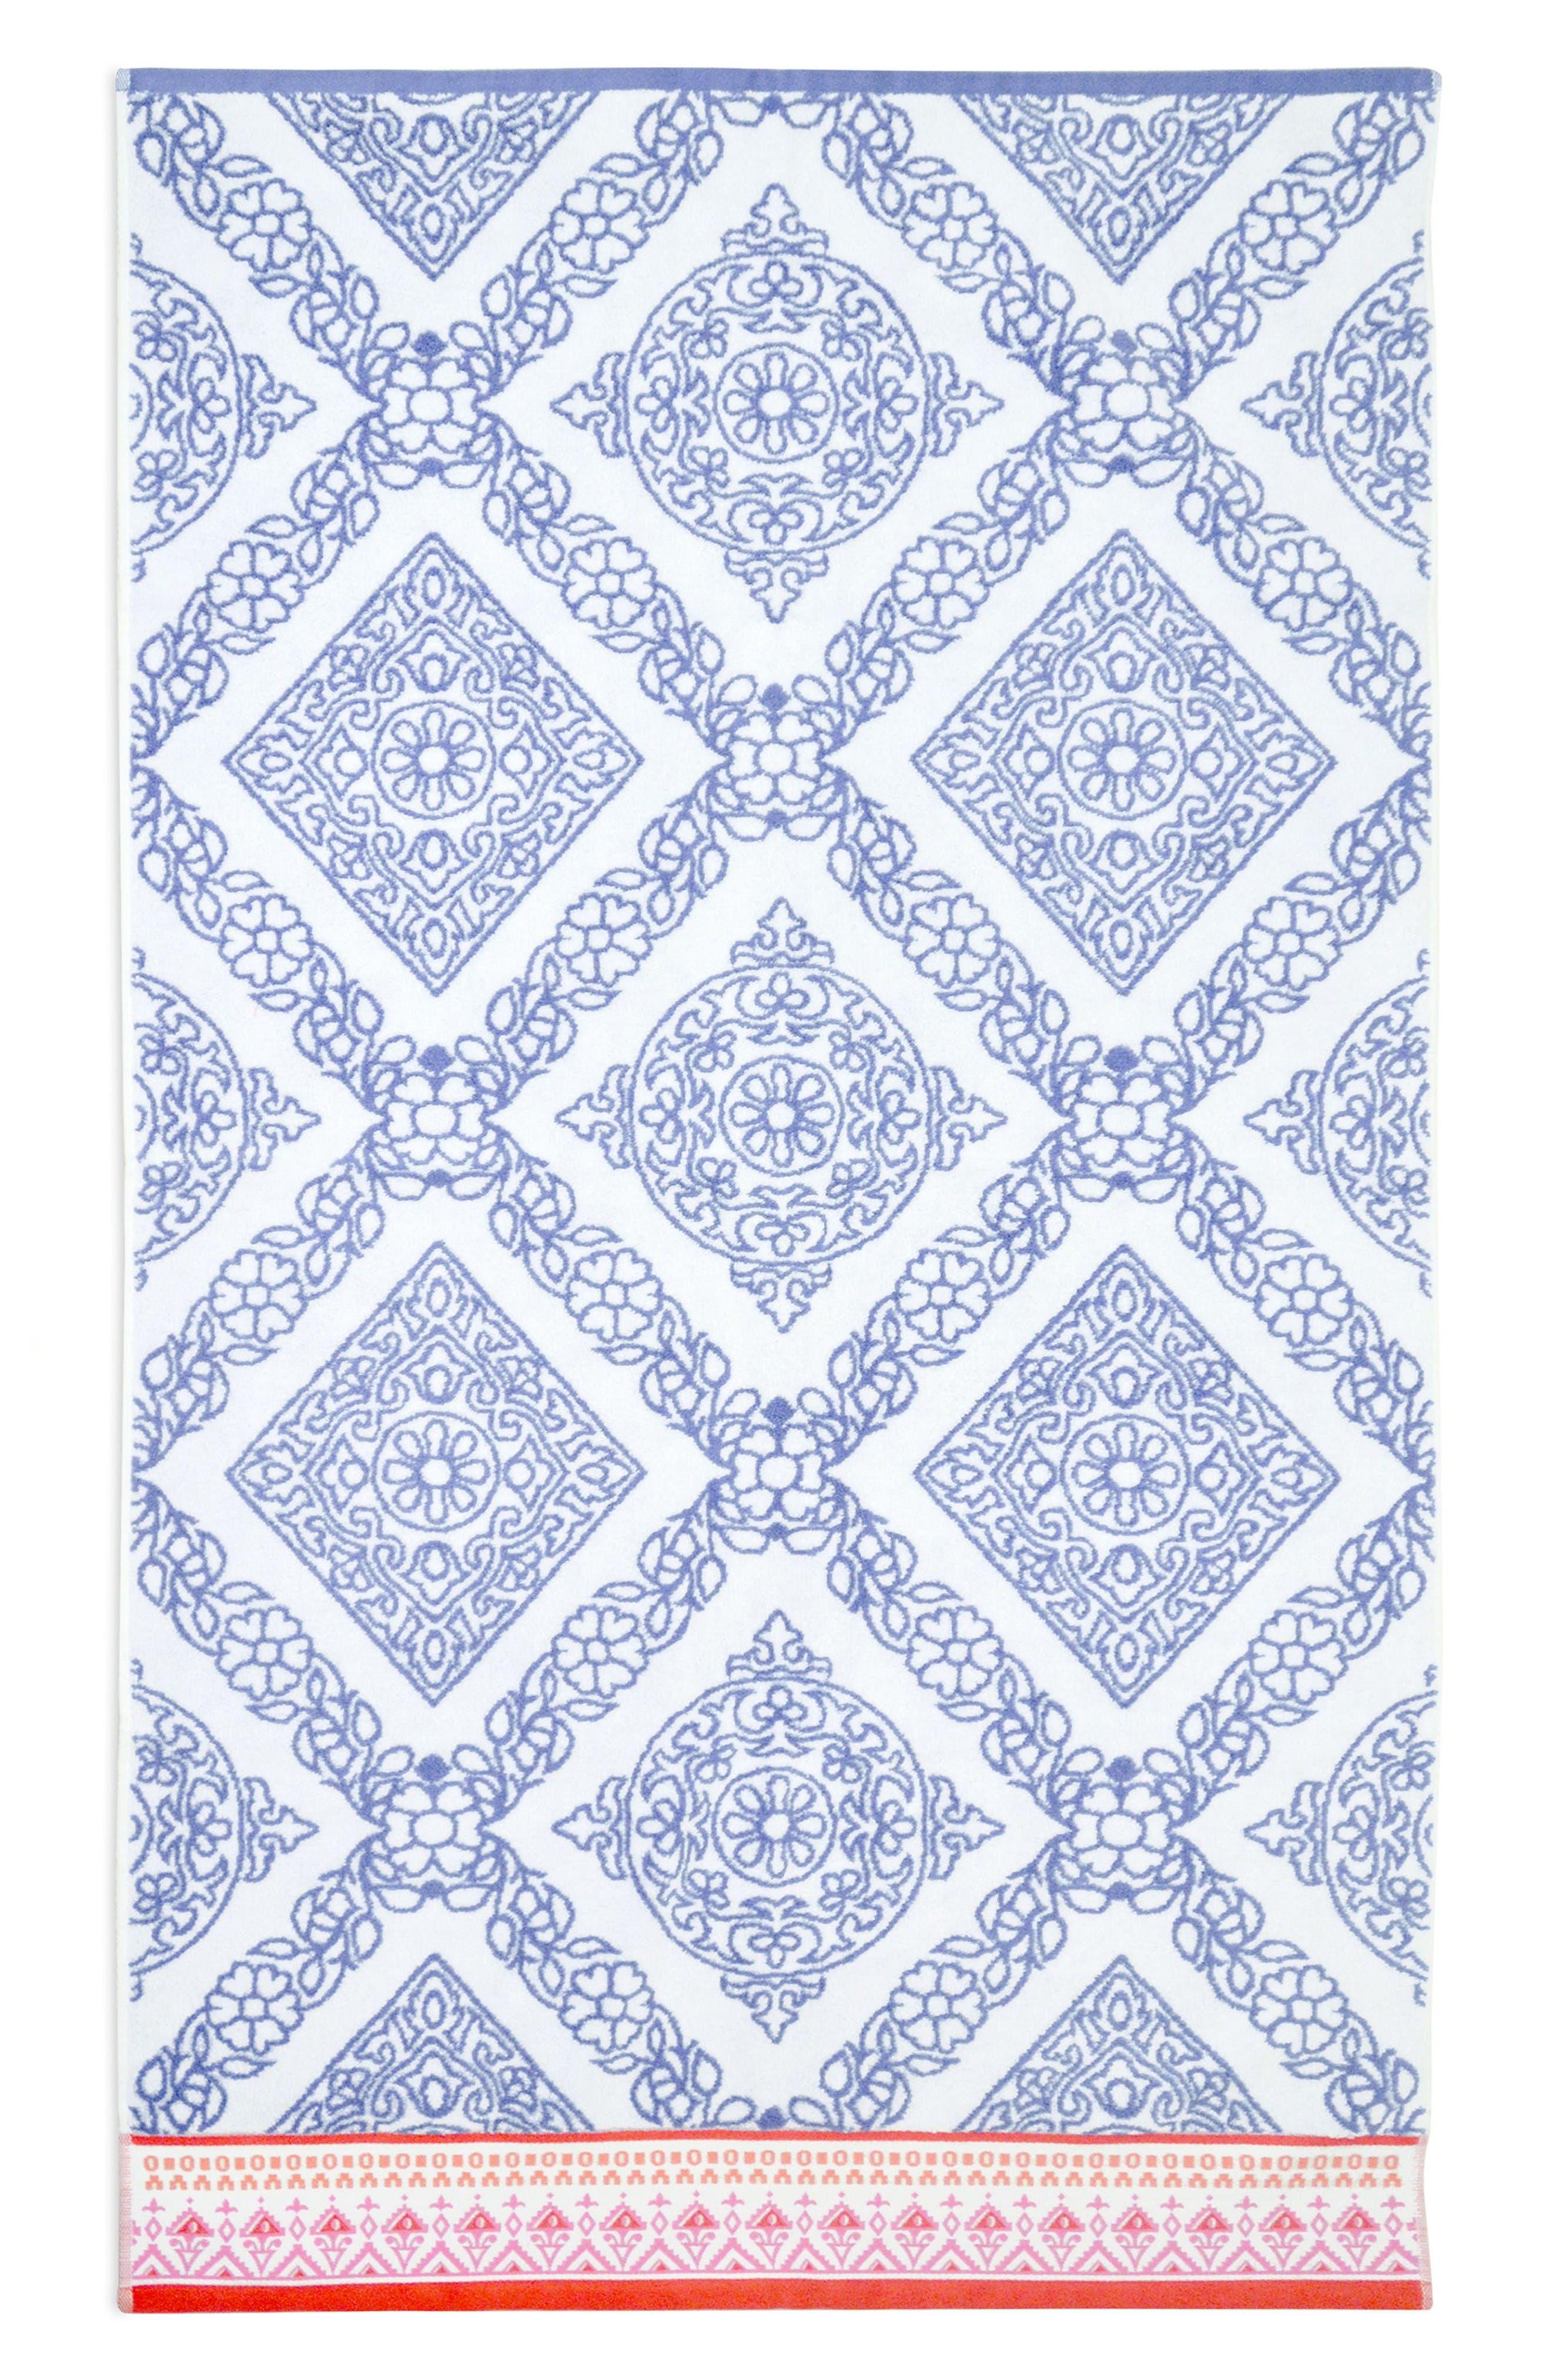 Main Image - John Robshaw Mitta Bath Towel